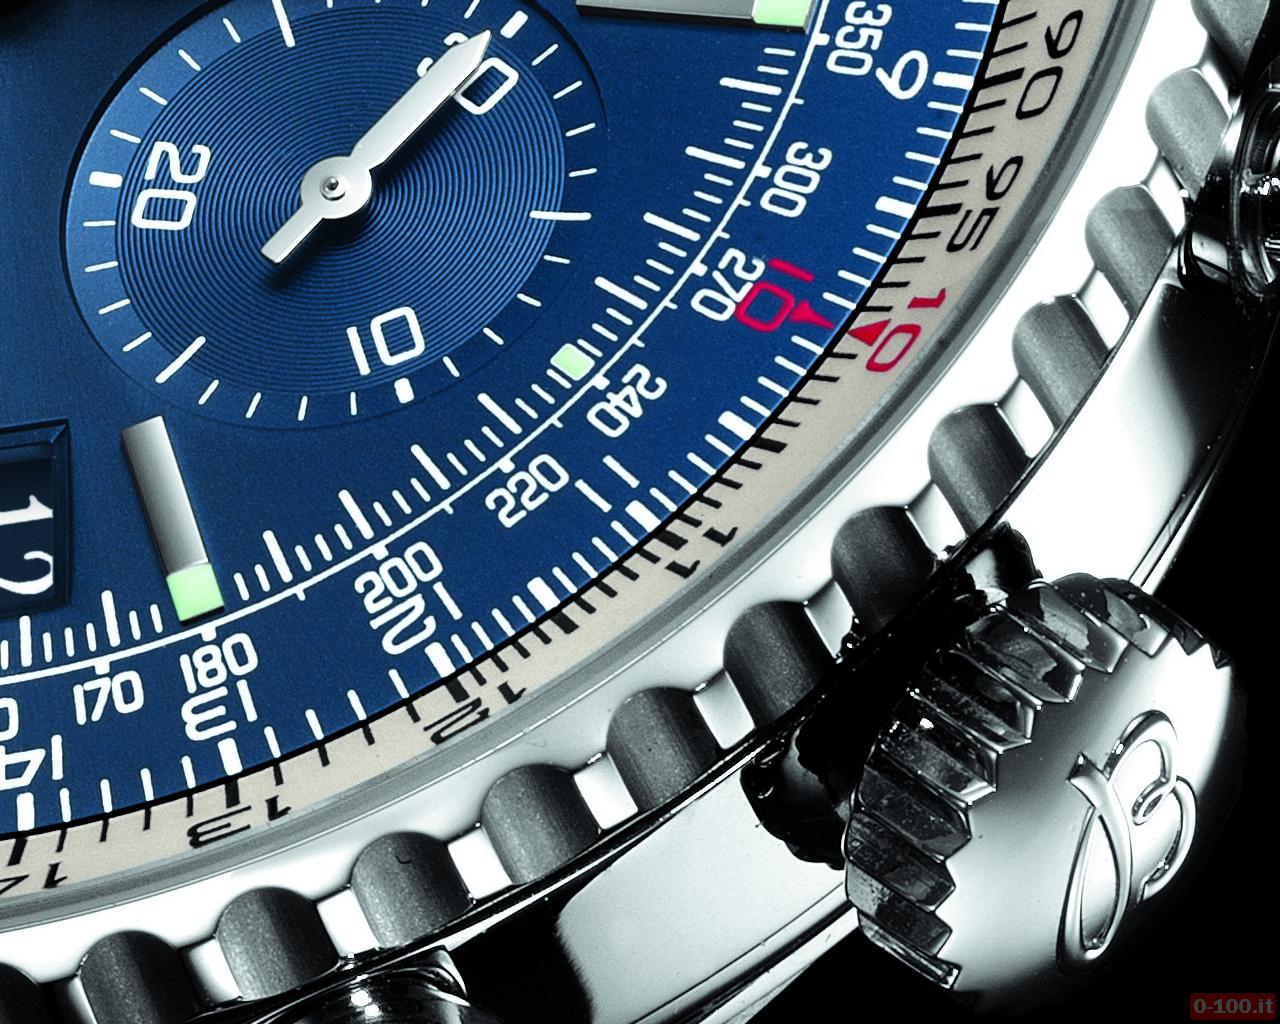 breitling-navitimer-blue-sky-limited-edition-60-anniversario_0-100_3